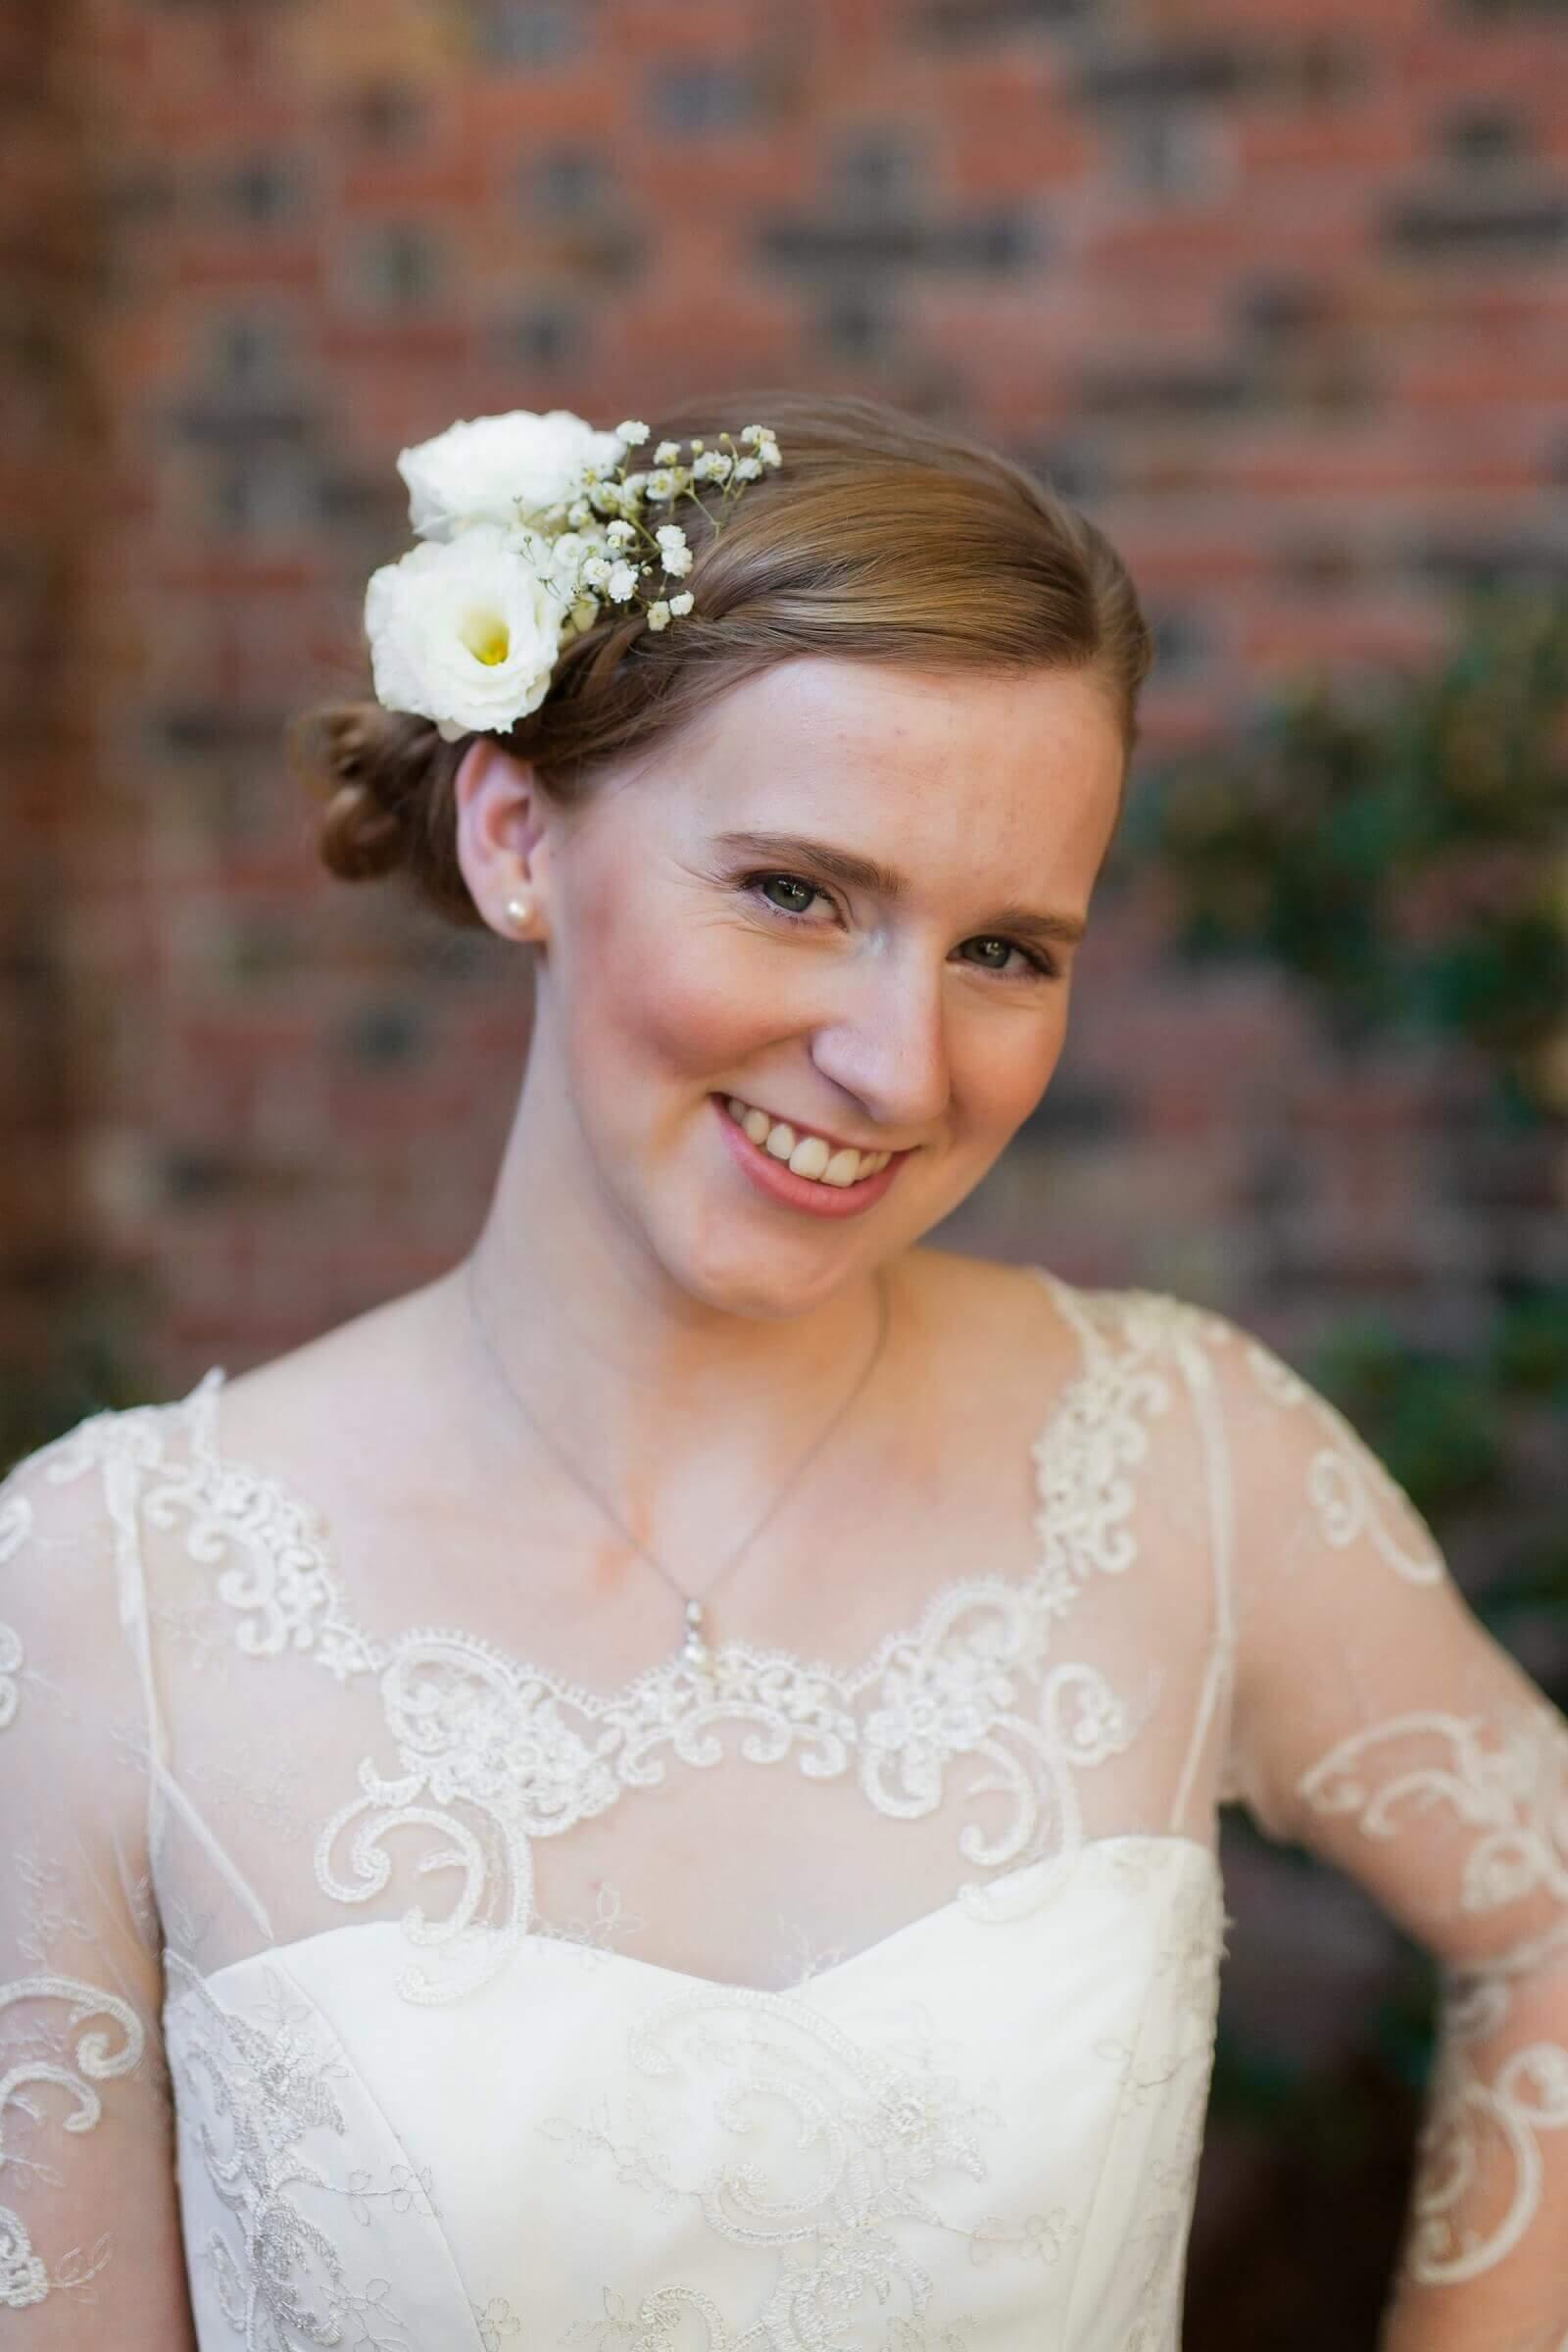 custom wedding dress for Esther by Rebecca Wendlandt